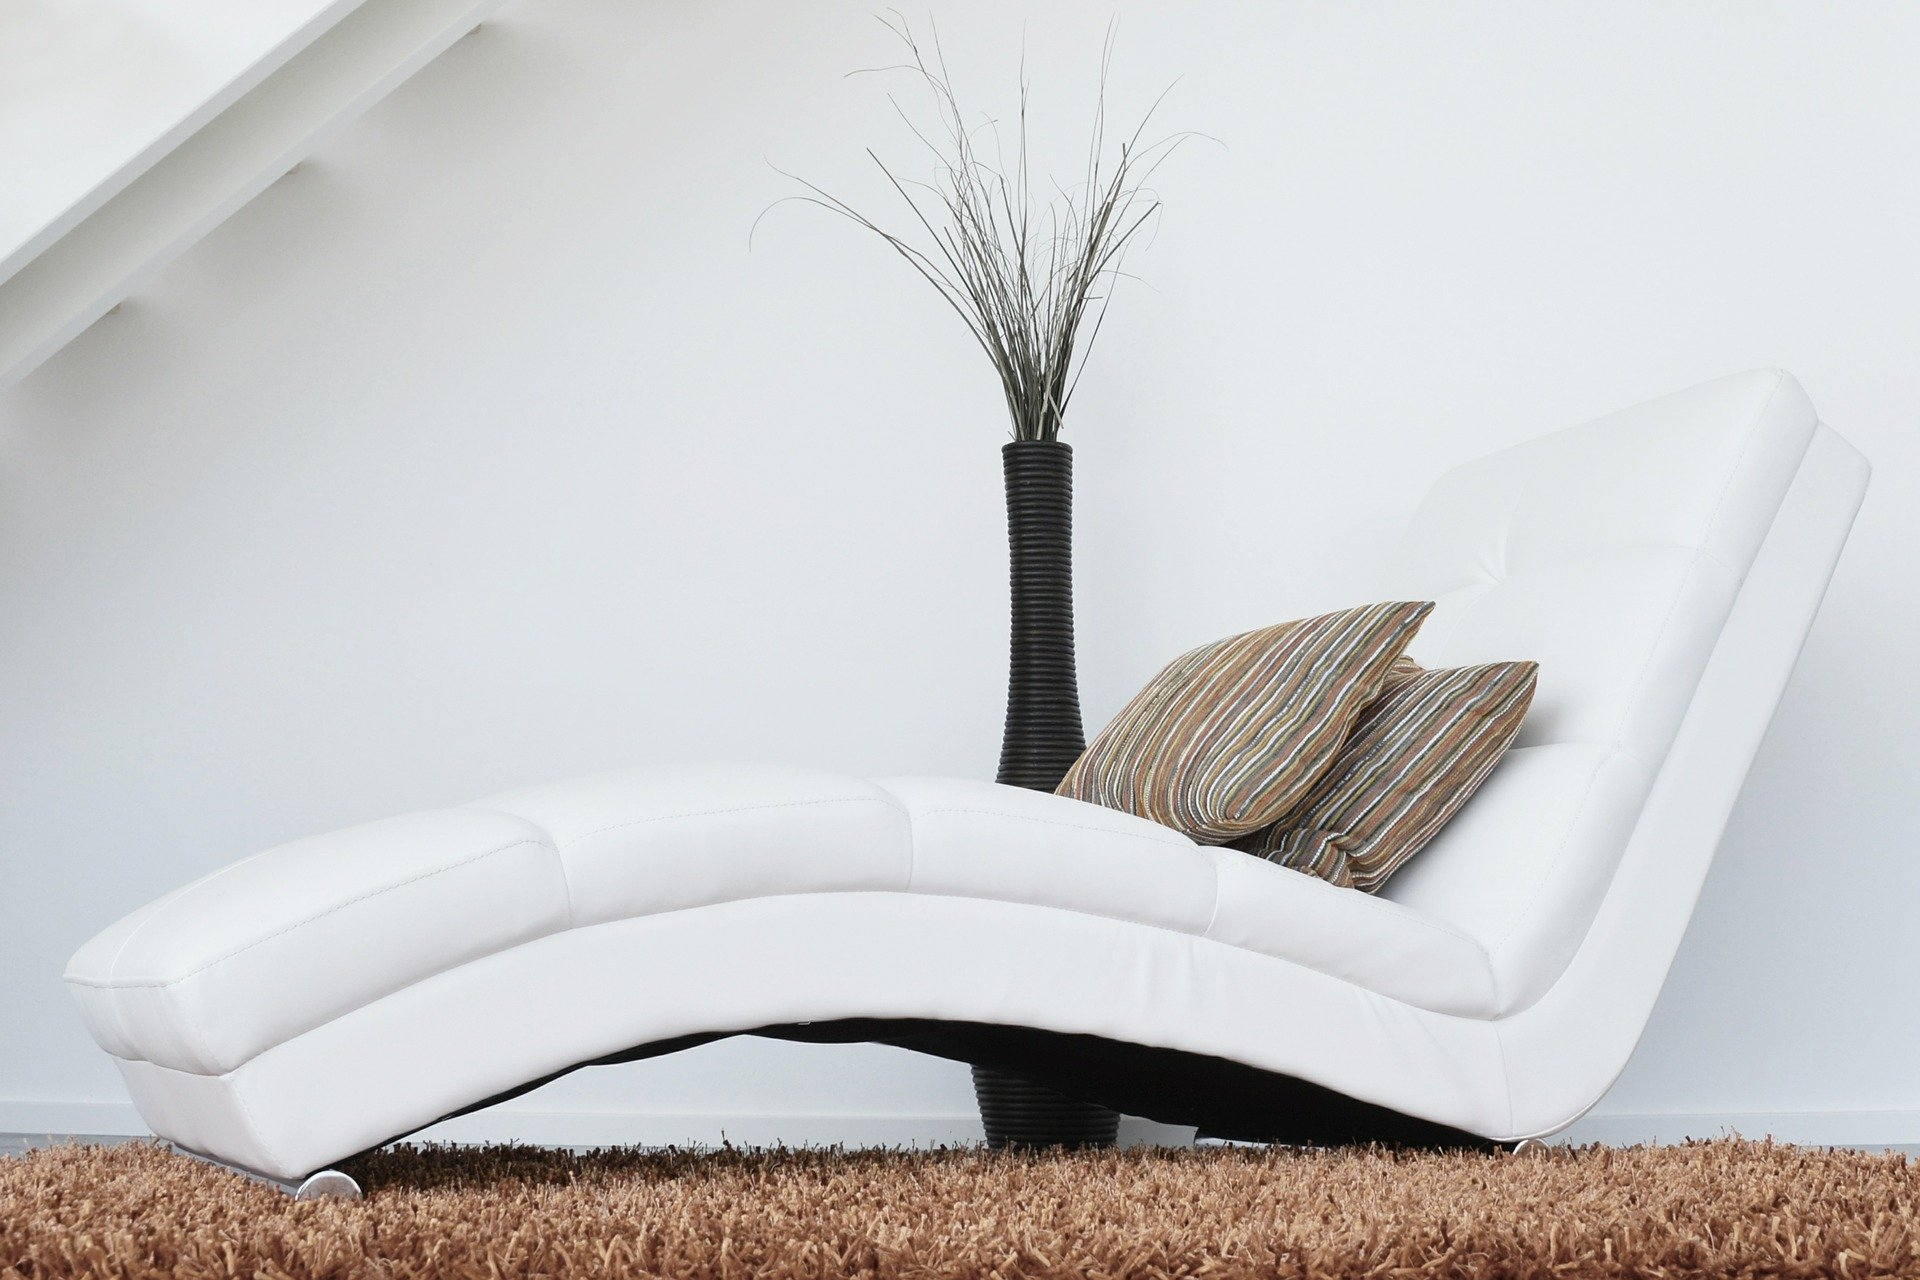 Séance de relaxation - sophrologie